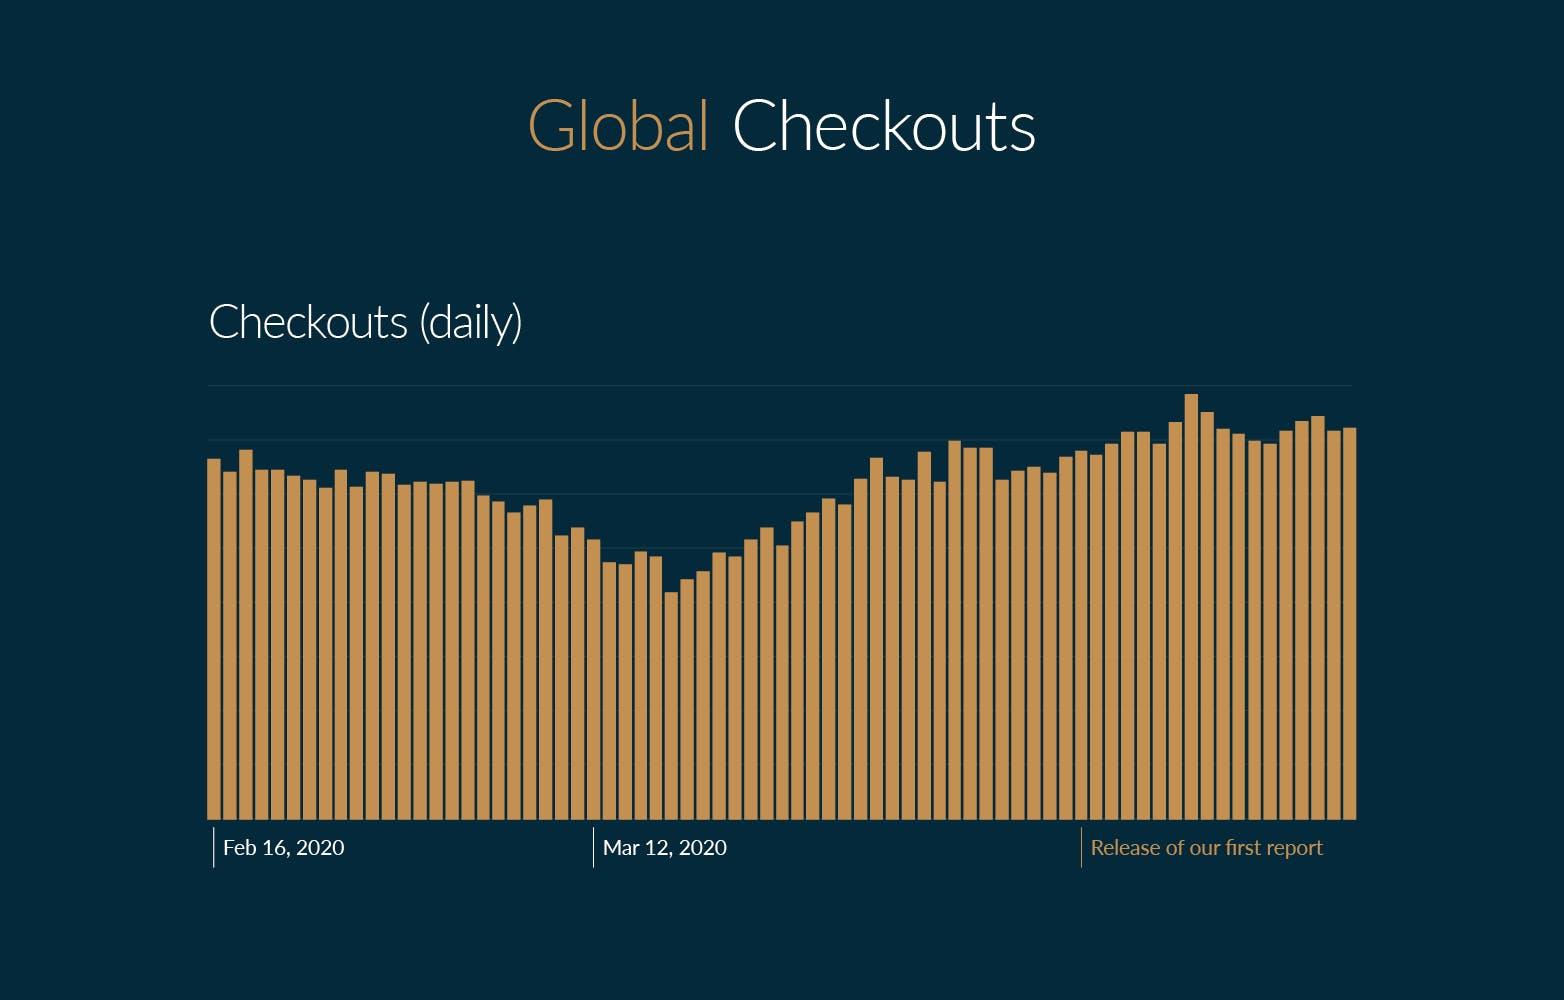 Global Checkouts on Chrono24 (daily)